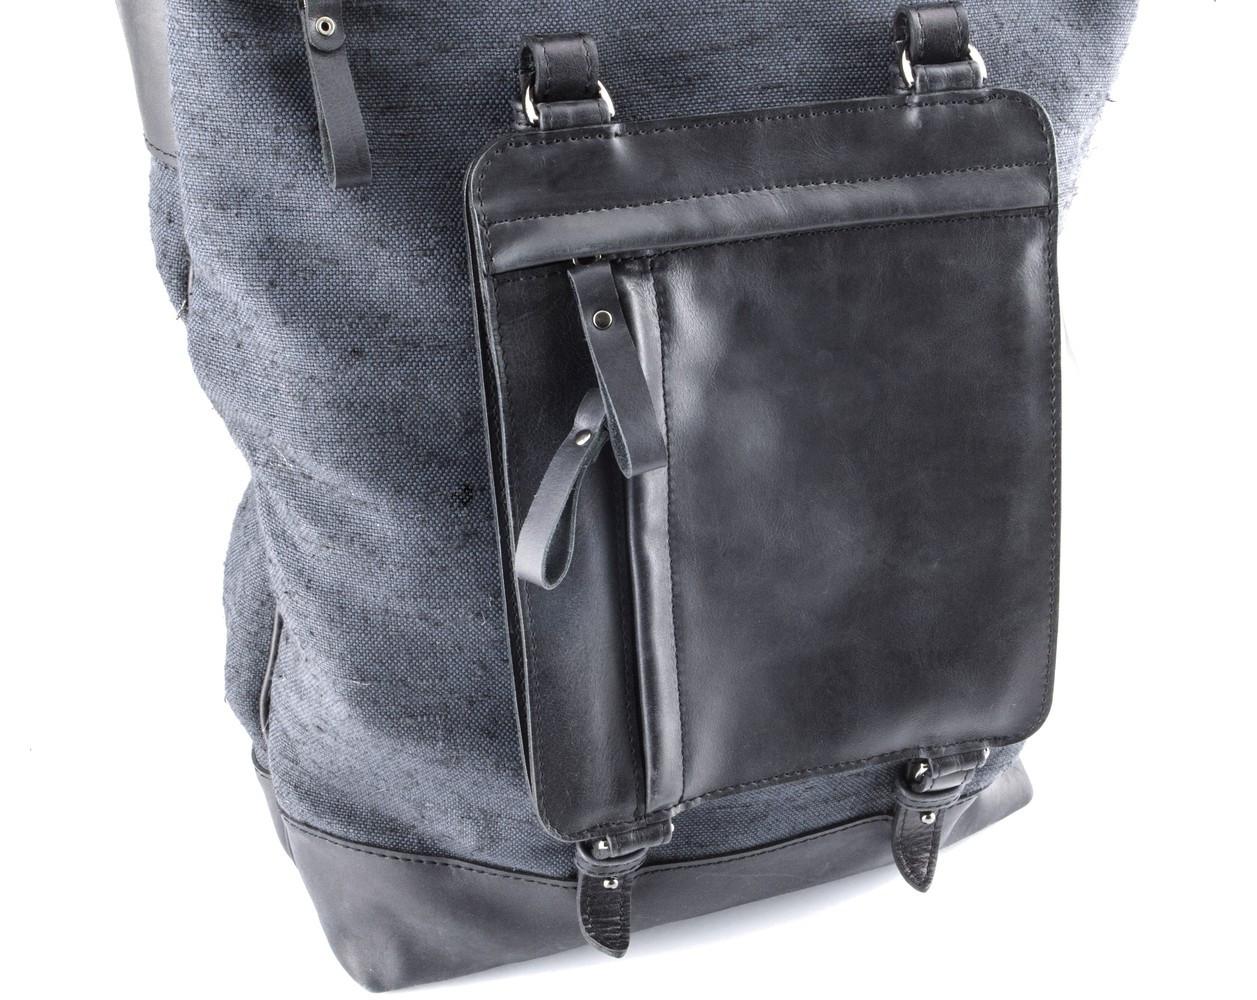 51ed005c0b78 Крутой рюкзак для мужчин из кожи и прочной ткани, цена 4 000 грн., купить в  Киеве — Prom.ua (ID#627992958)